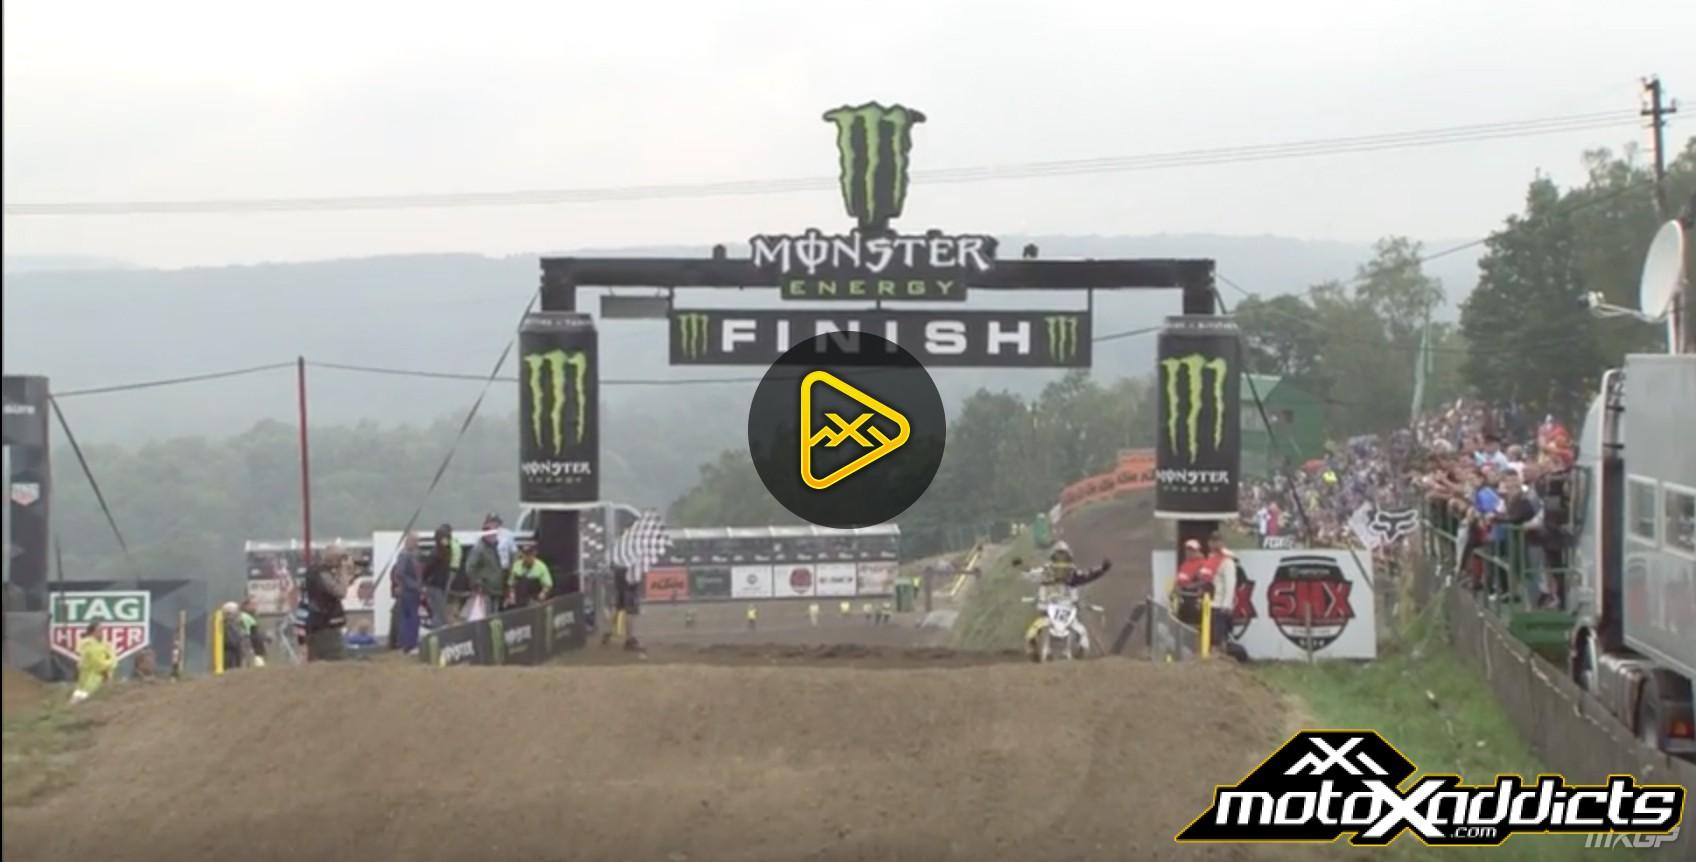 2016 MXGP of Czech Republic (Loket) Highlights